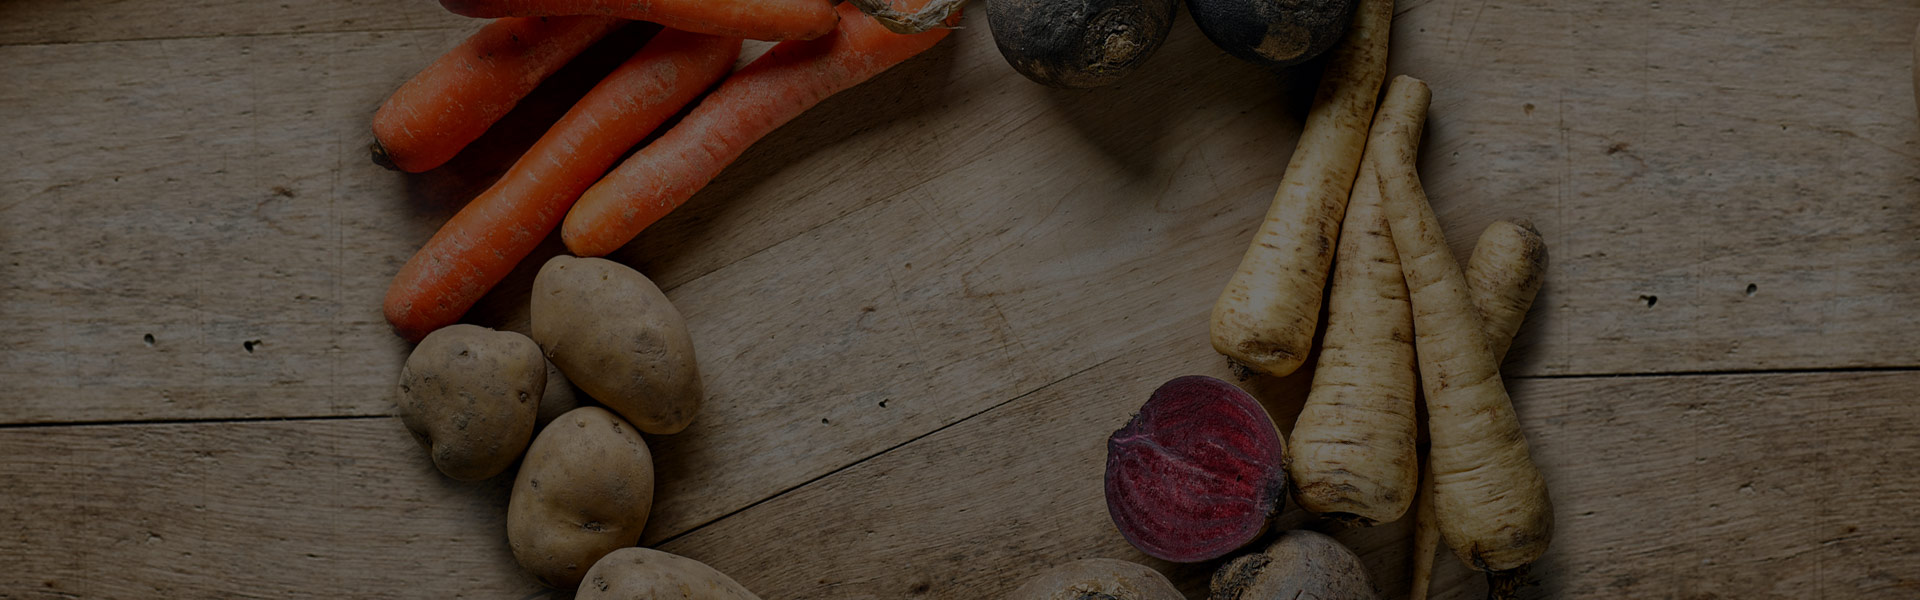 in-dey-go-header-harvest-image